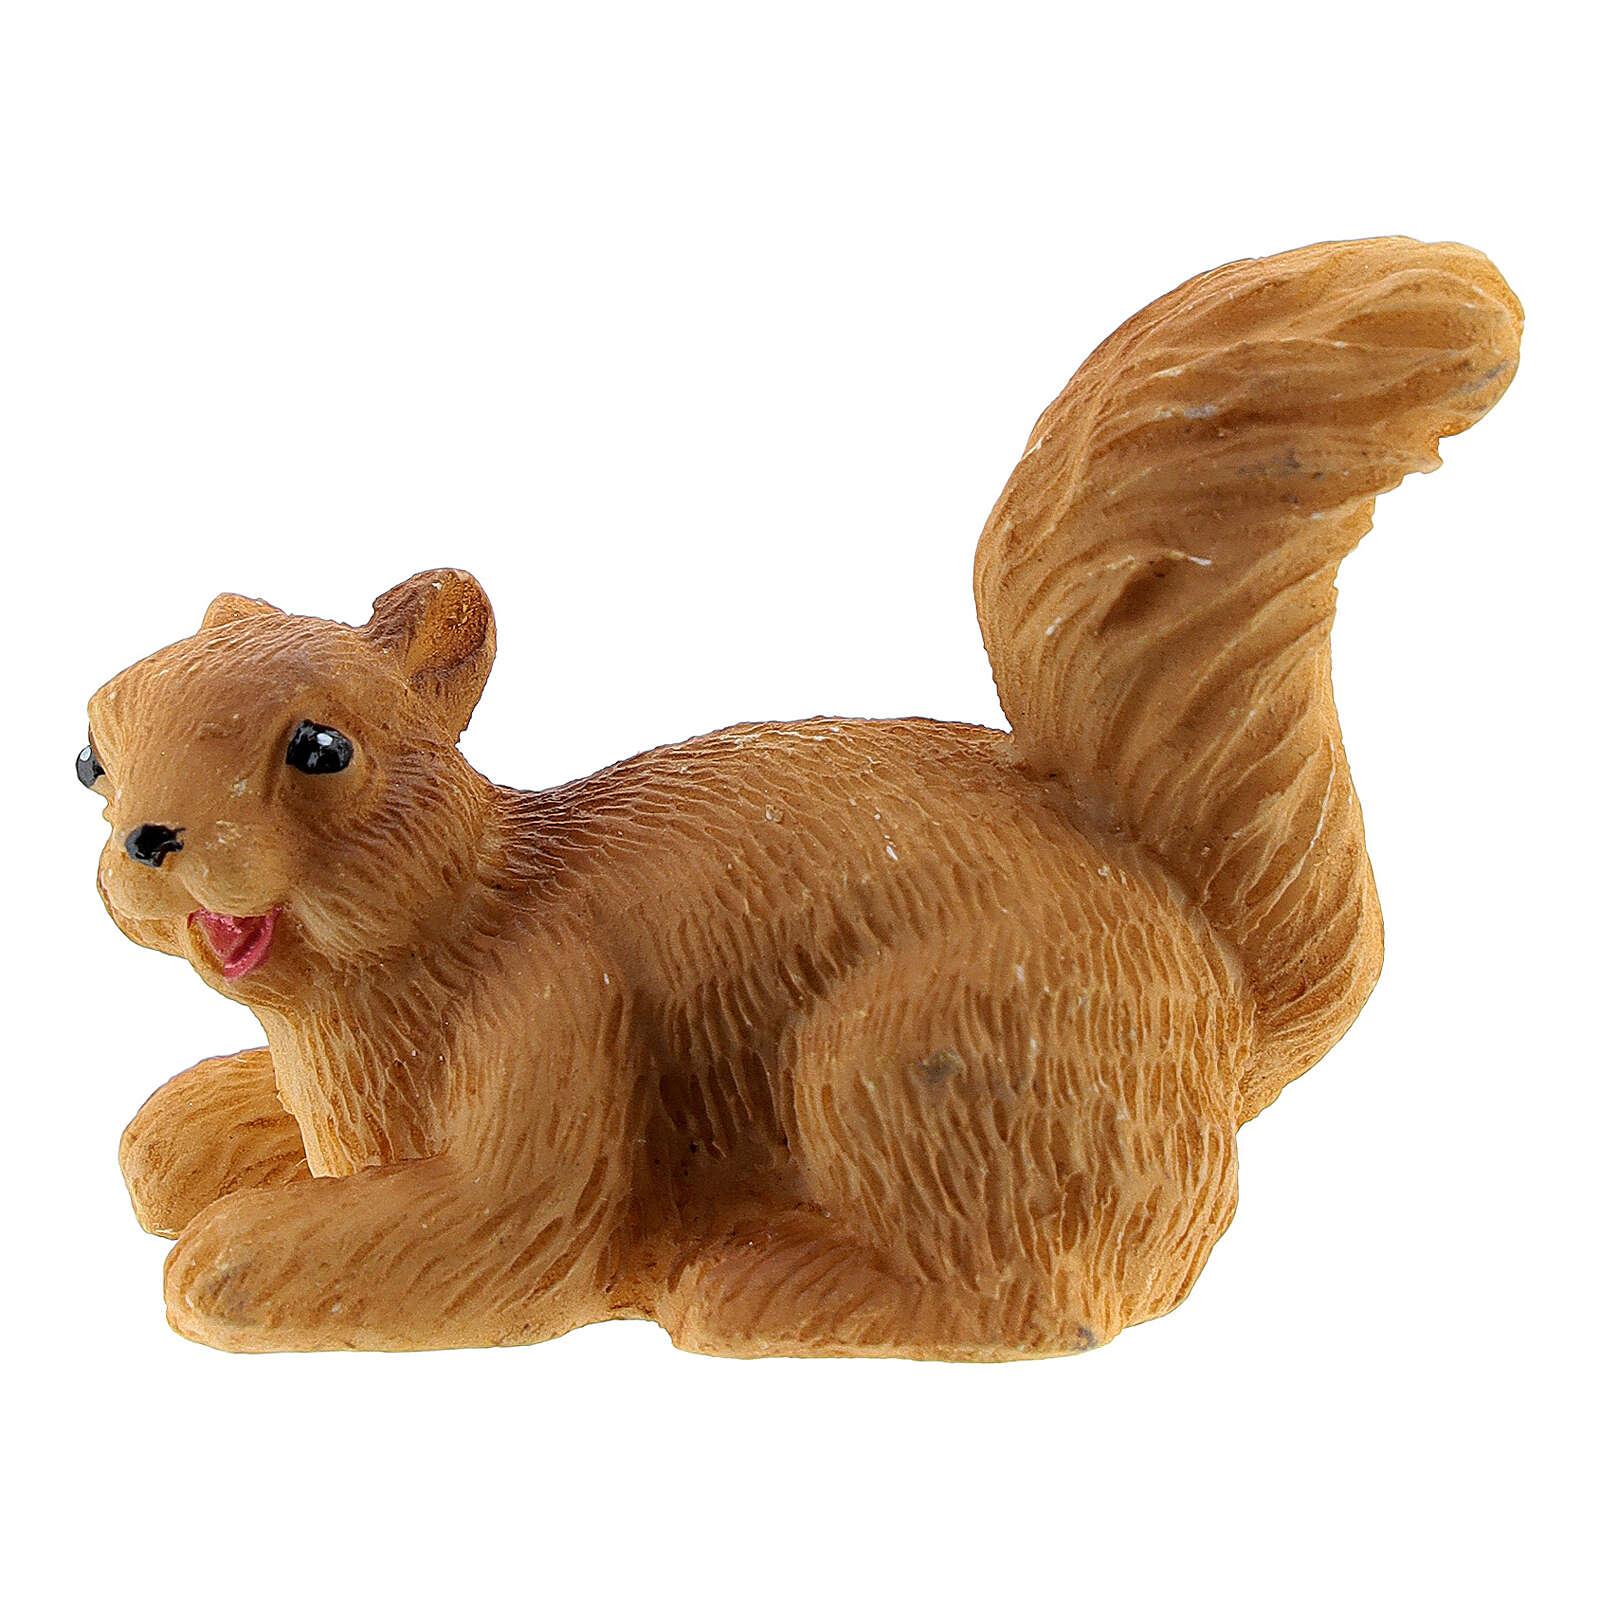 Squirrel 3 cm for Nativity Scene with 14-18 cm figurines 3